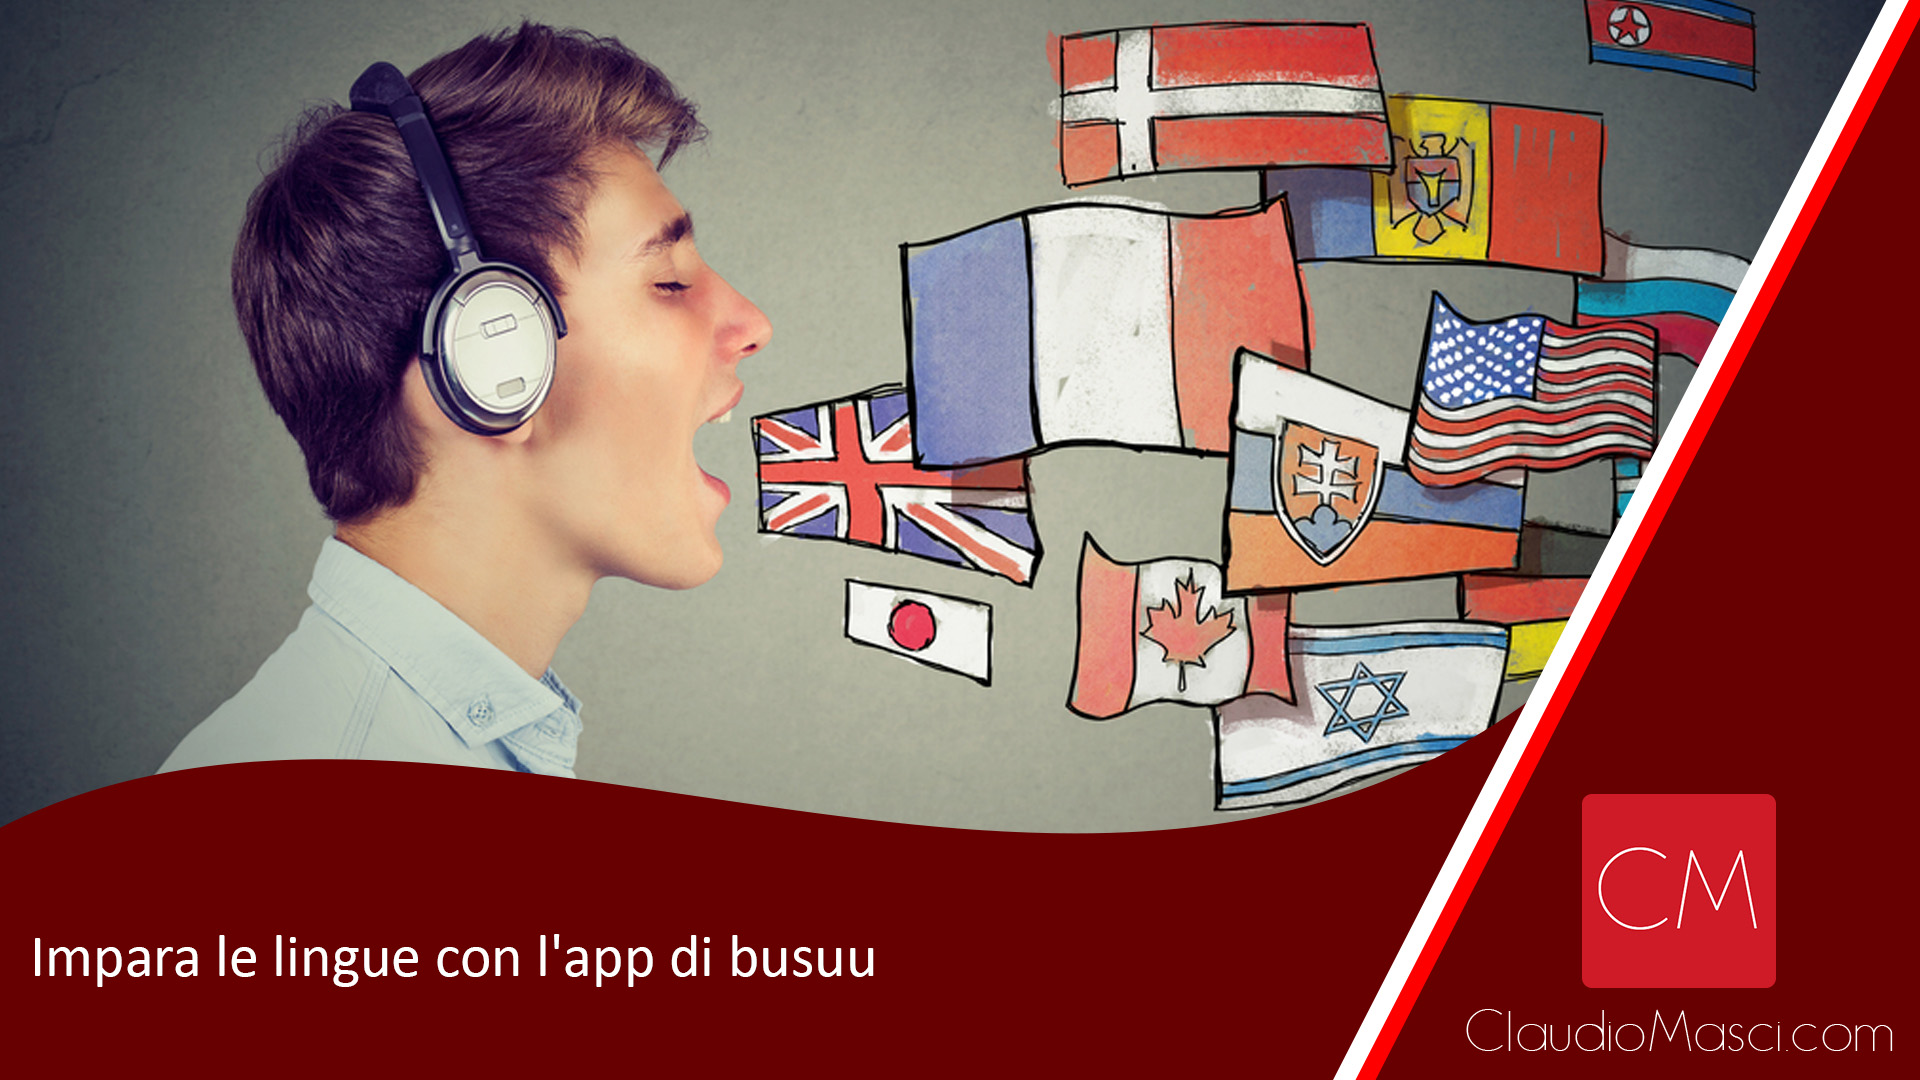 Impara le lingue con l'app di busuu